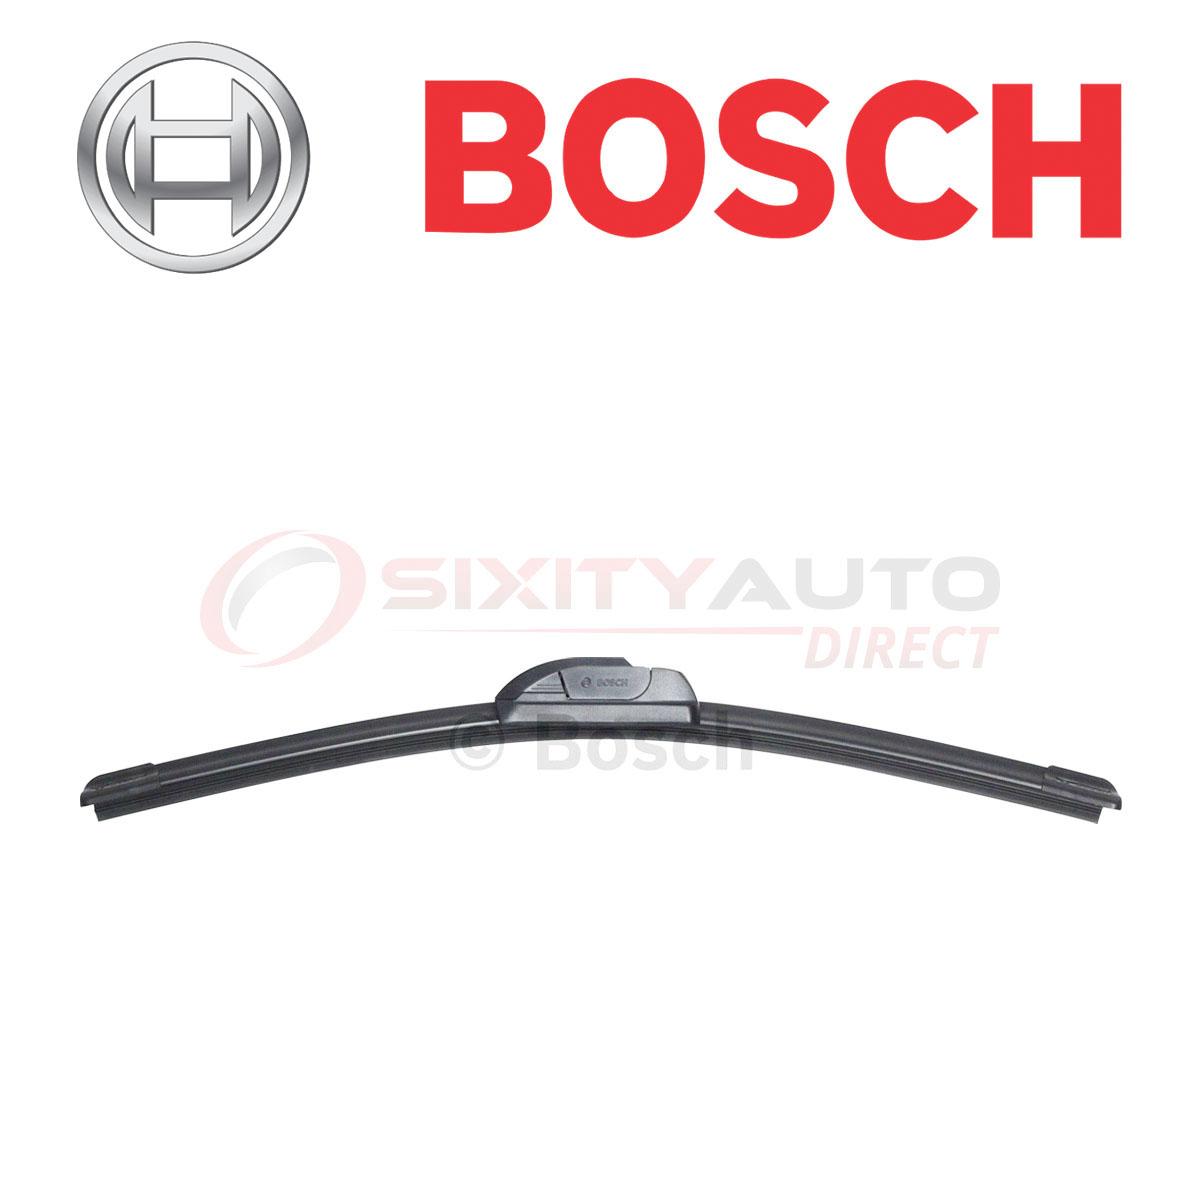 Bosch Icon Windshield Wiper Blade For 2015-2017 Acura TLX